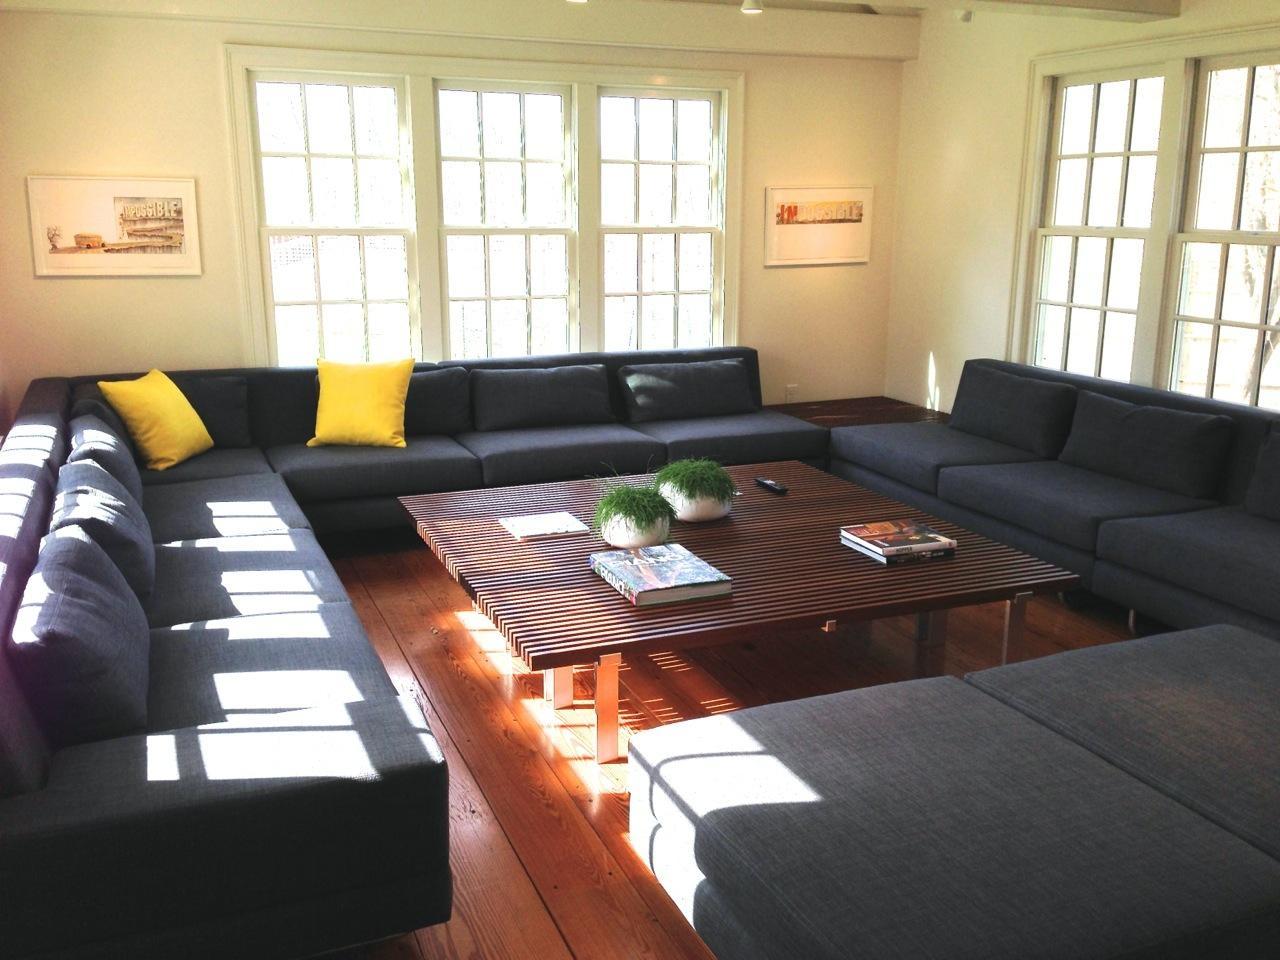 Hamlin Sofas / True Modern Blog – Truemodern™ Throughout Giant Sofas (Image 17 of 20)